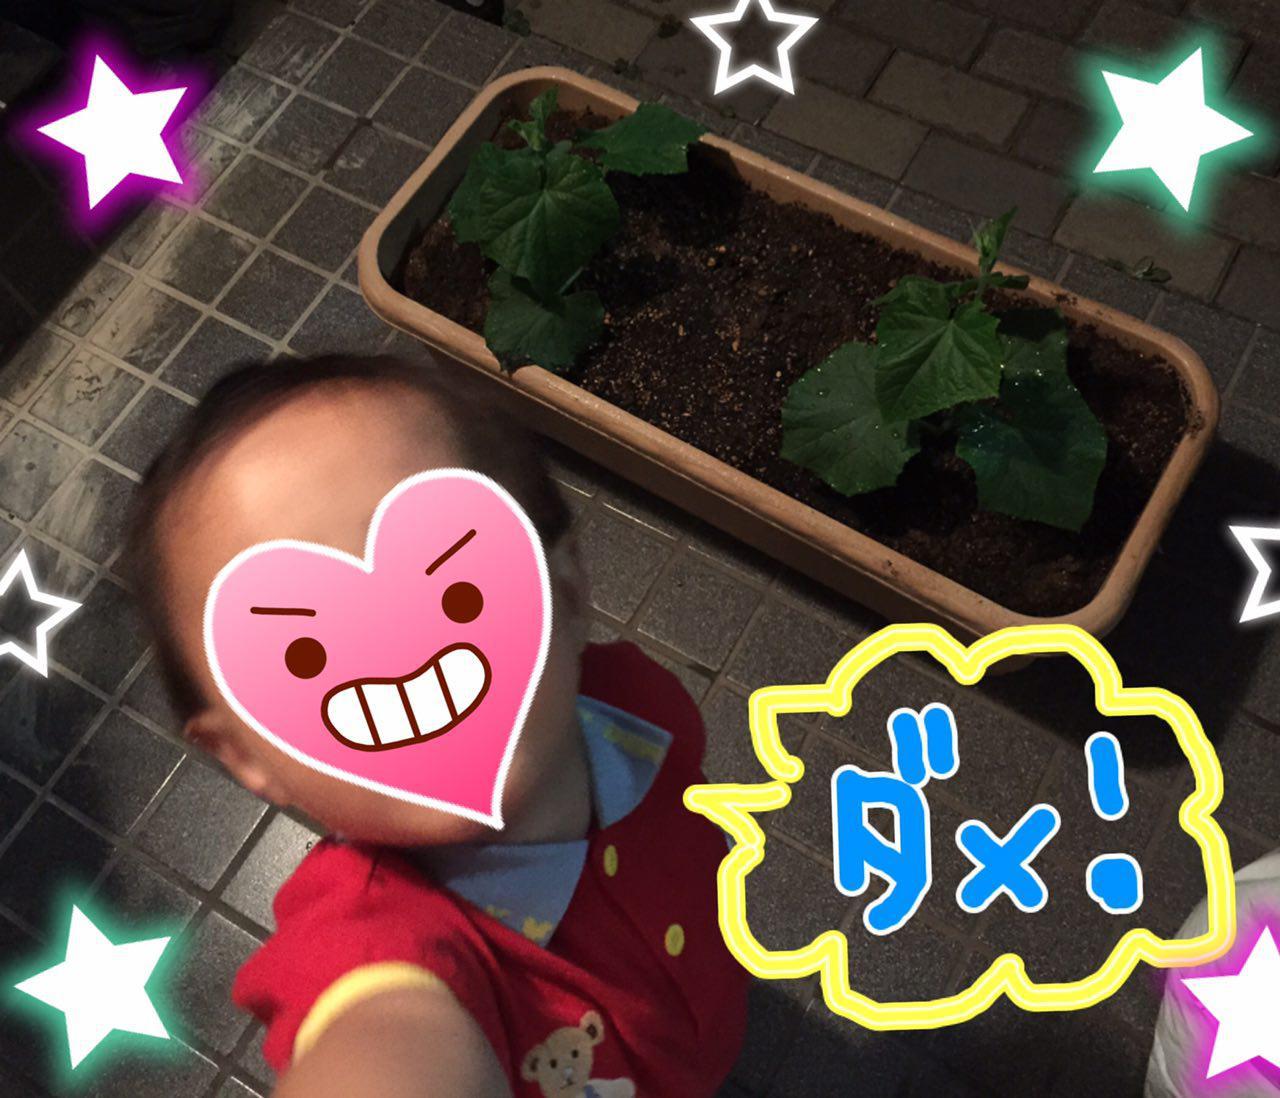 photo_2017-05-25_00-30-11.jpg